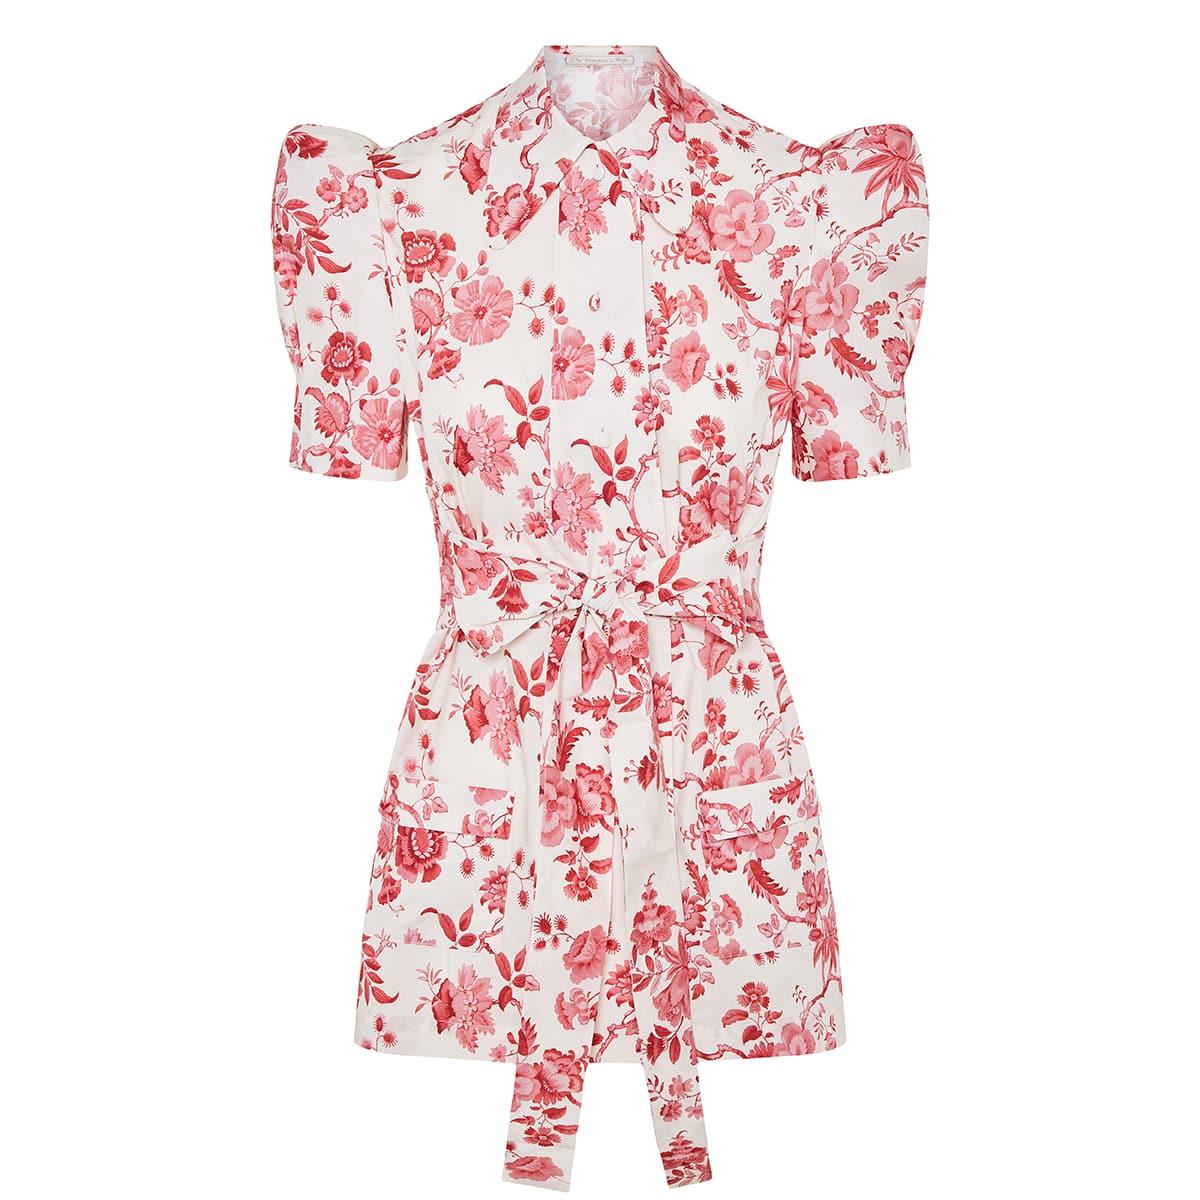 The Persuasion floral cotton blouse